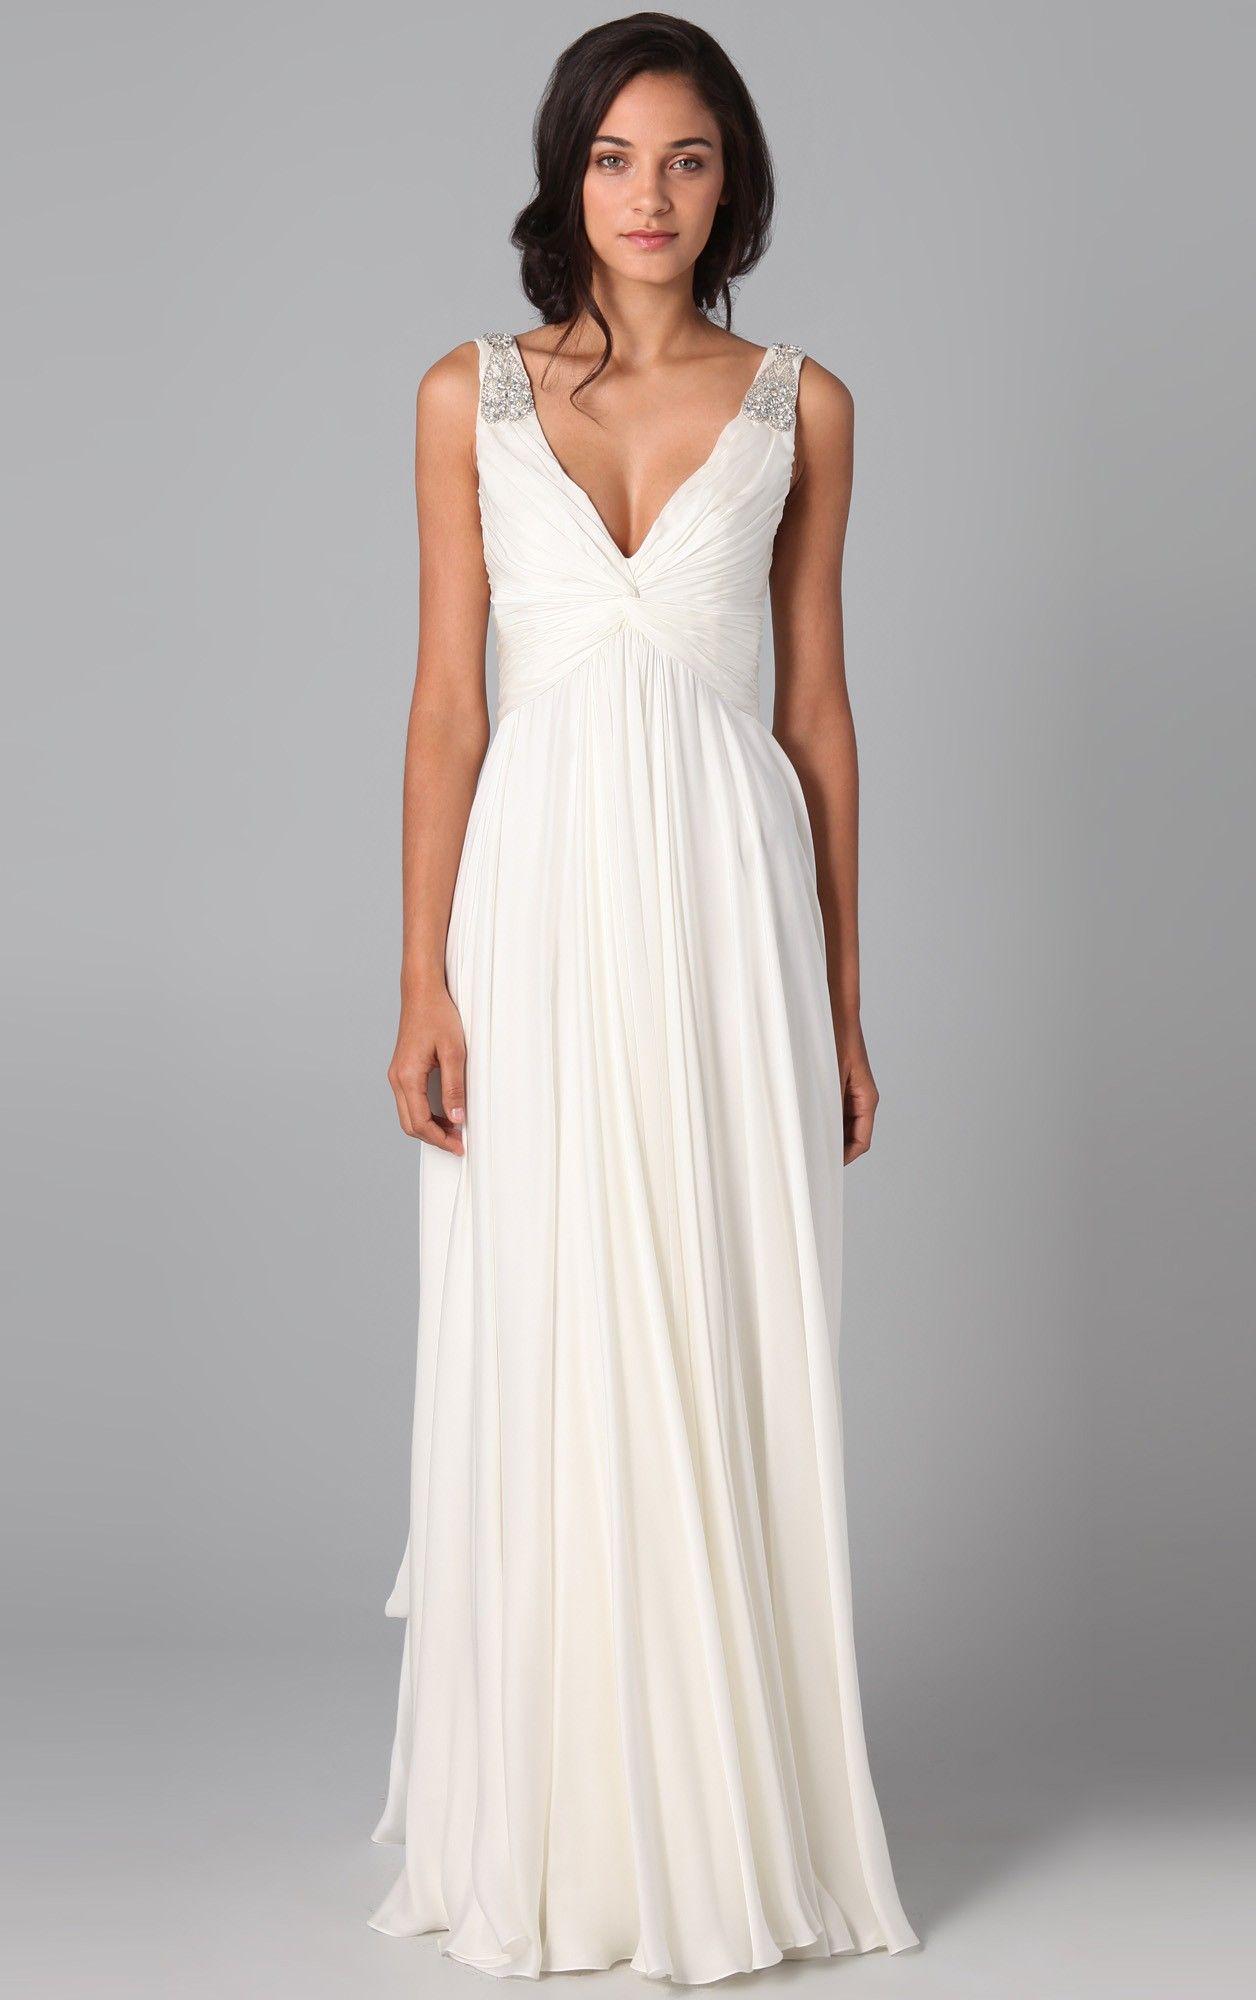 White Chiffon Prom Dresses